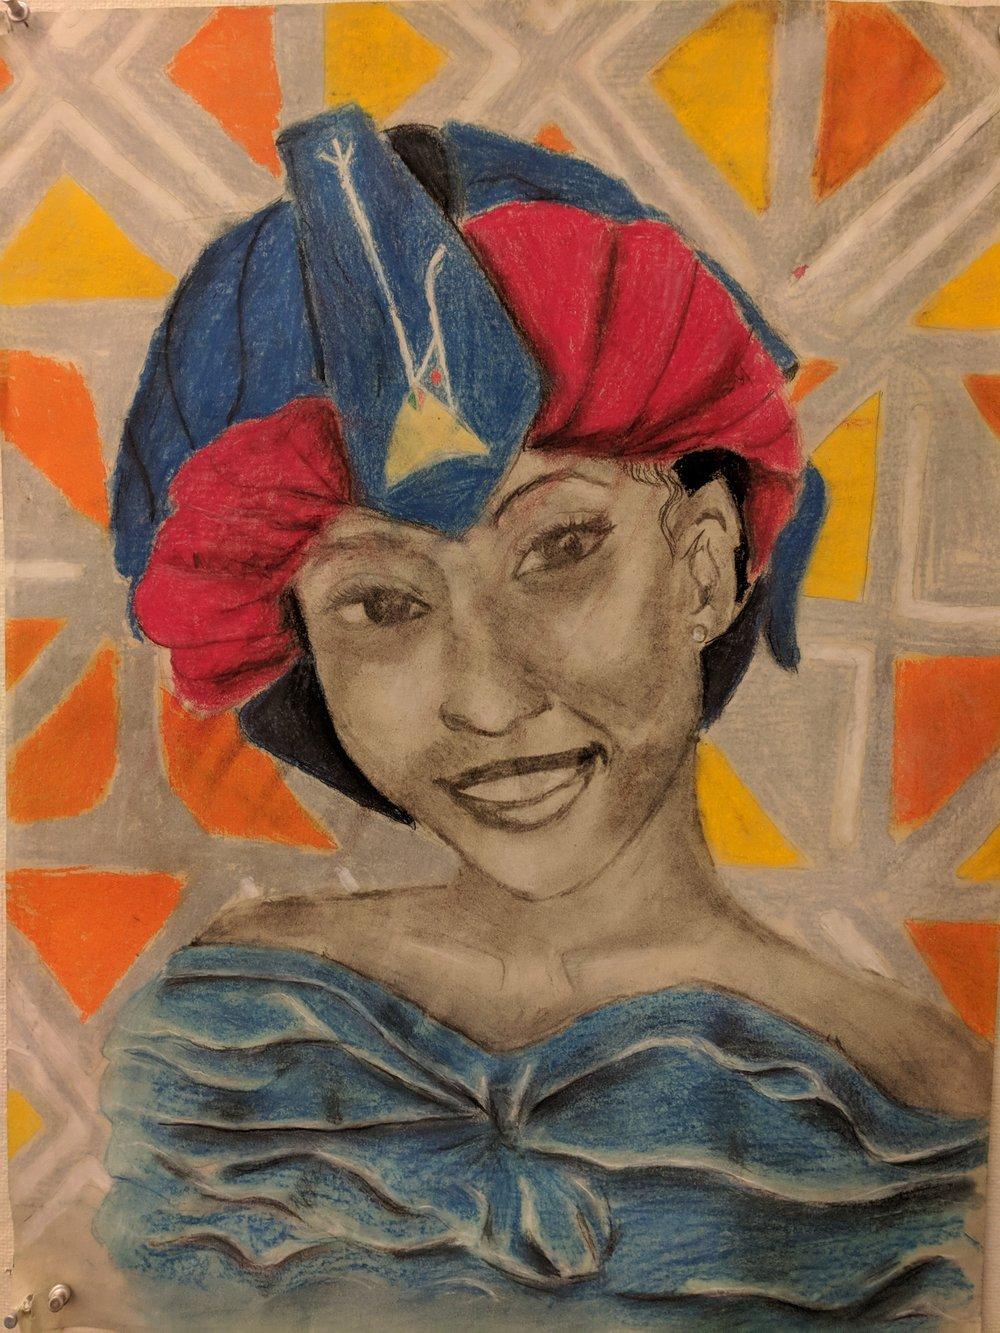 Marie's Sankofa Self-Portrait